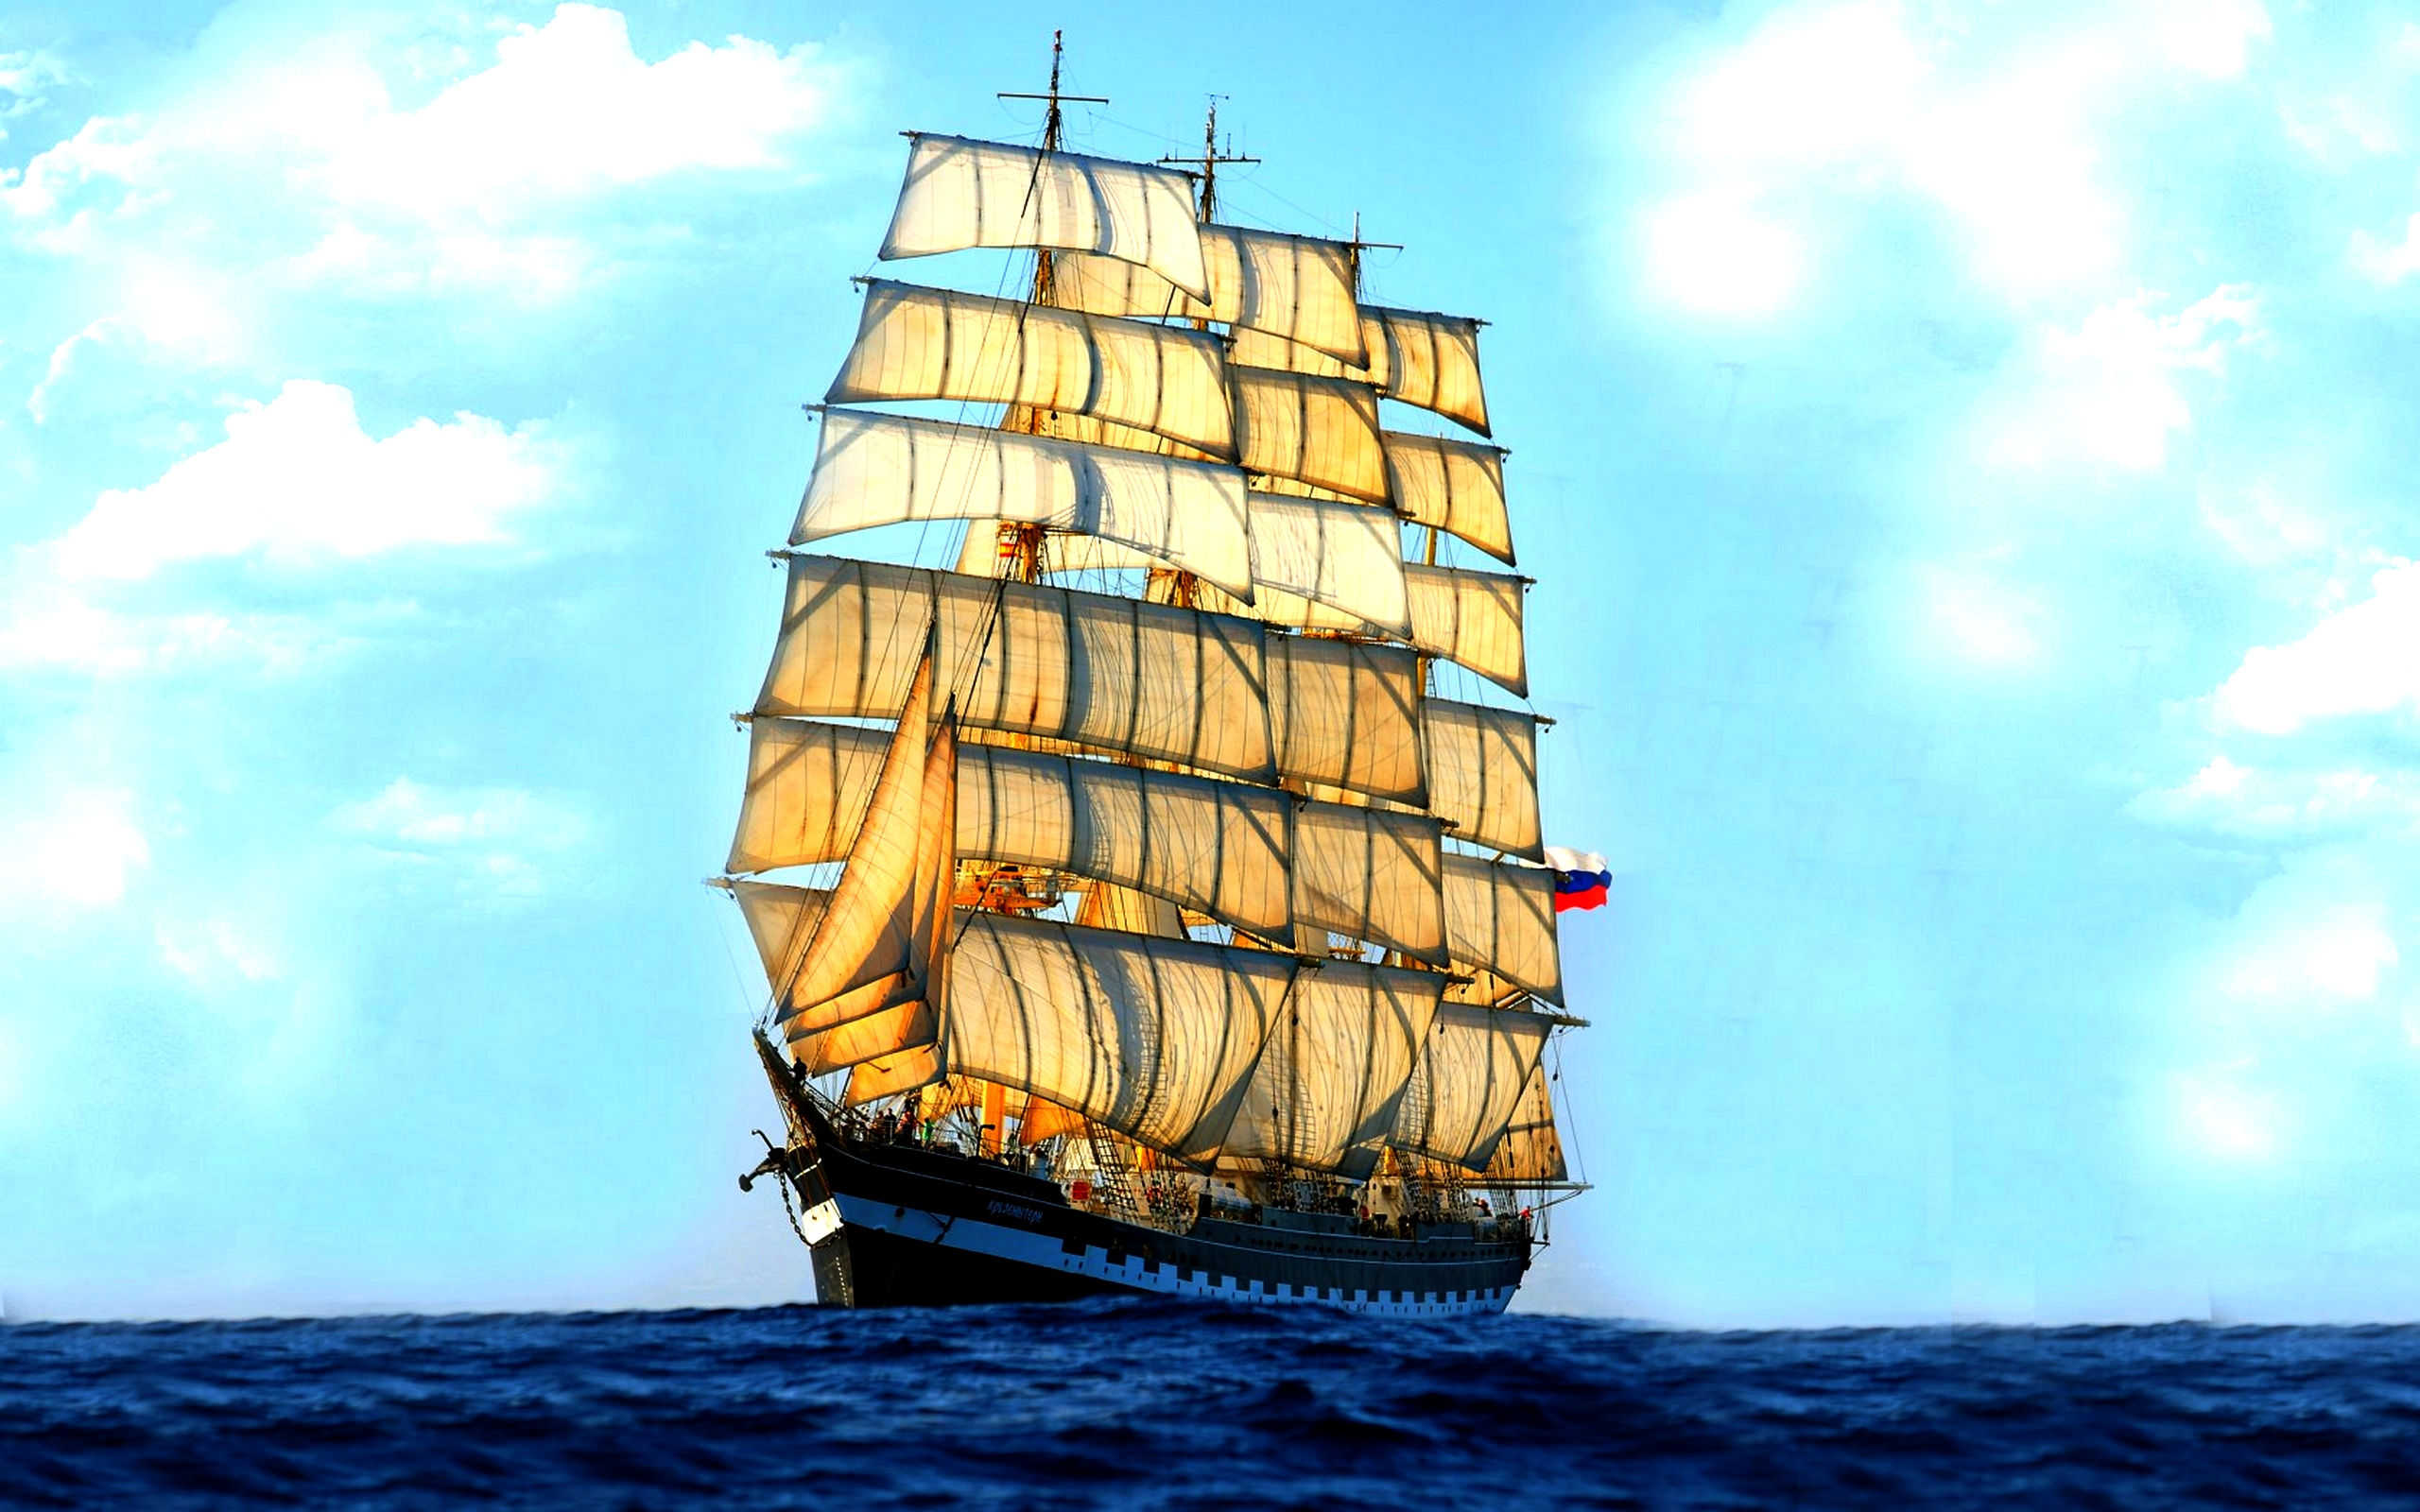 sailboat wallpaper 7789